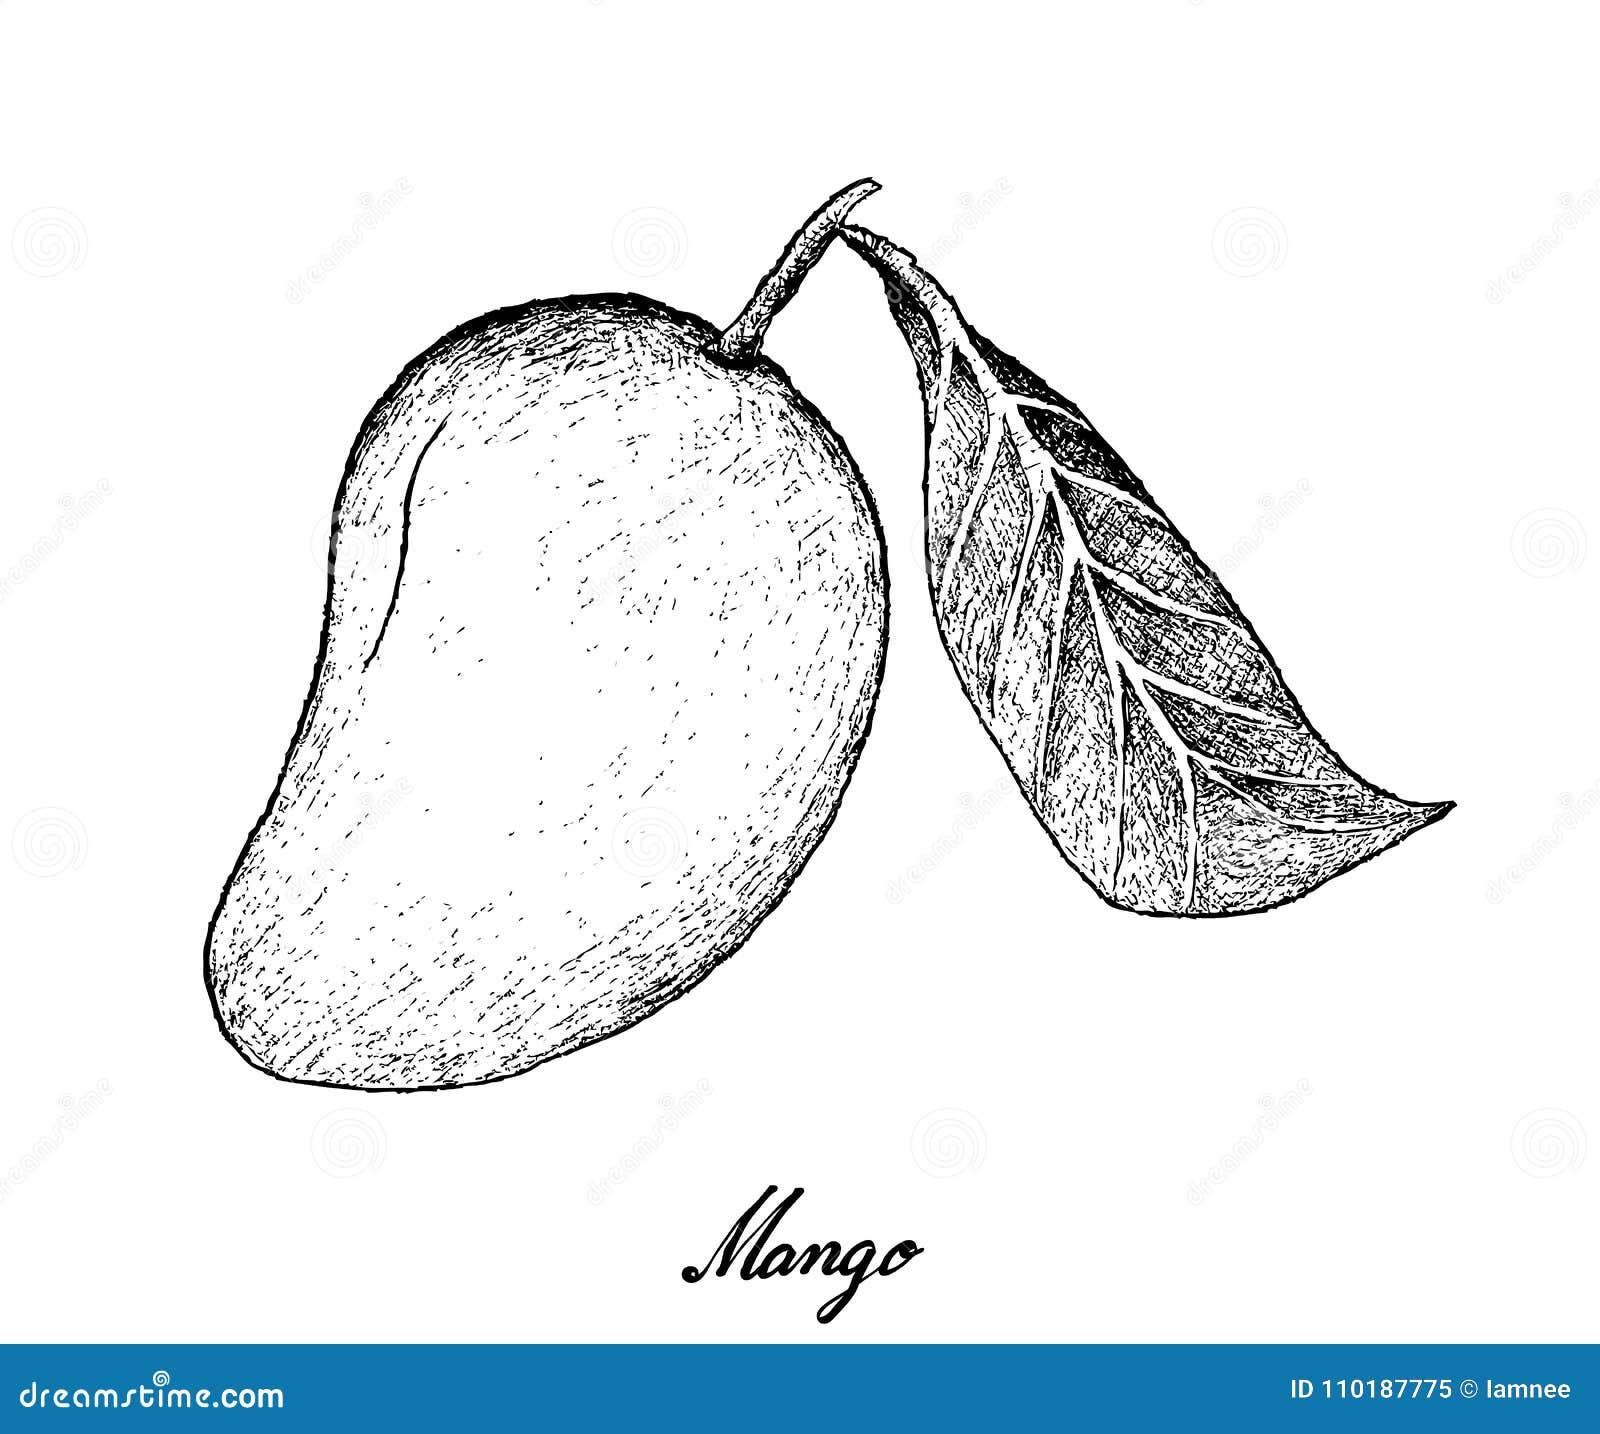 Tropical fruits illustration of hand drawn sketch fresh ripe mango fruits isolated on white background